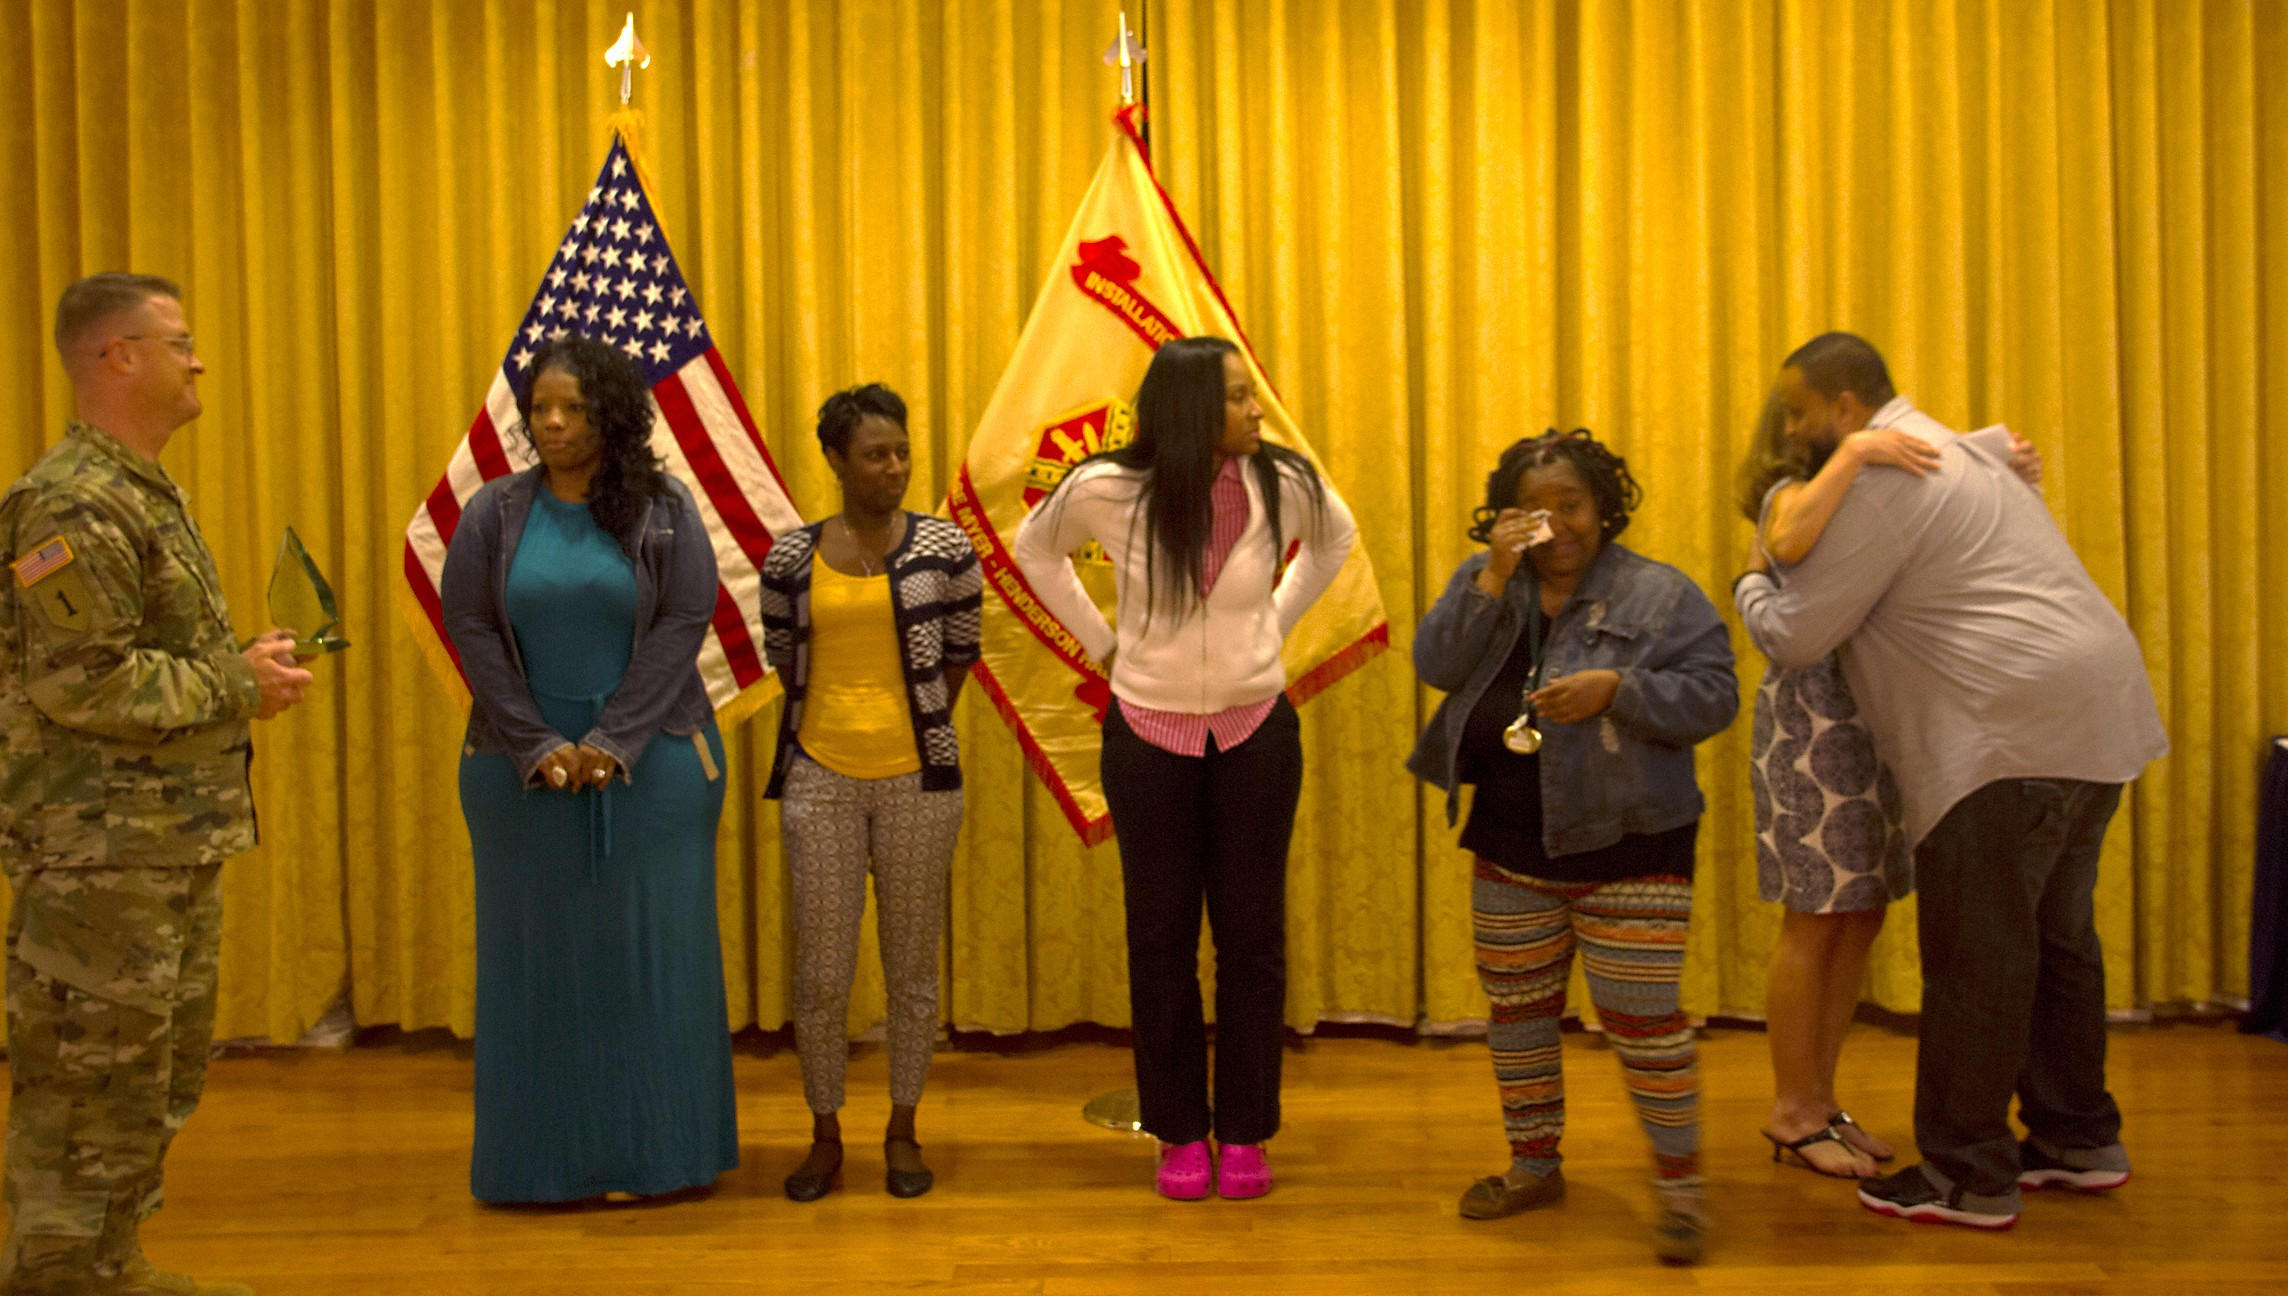 Jbmhh Honors Children's Heroes At Blue Tie Affair Jbmhh Honors Children's  Heroes At Blue Tie Affair